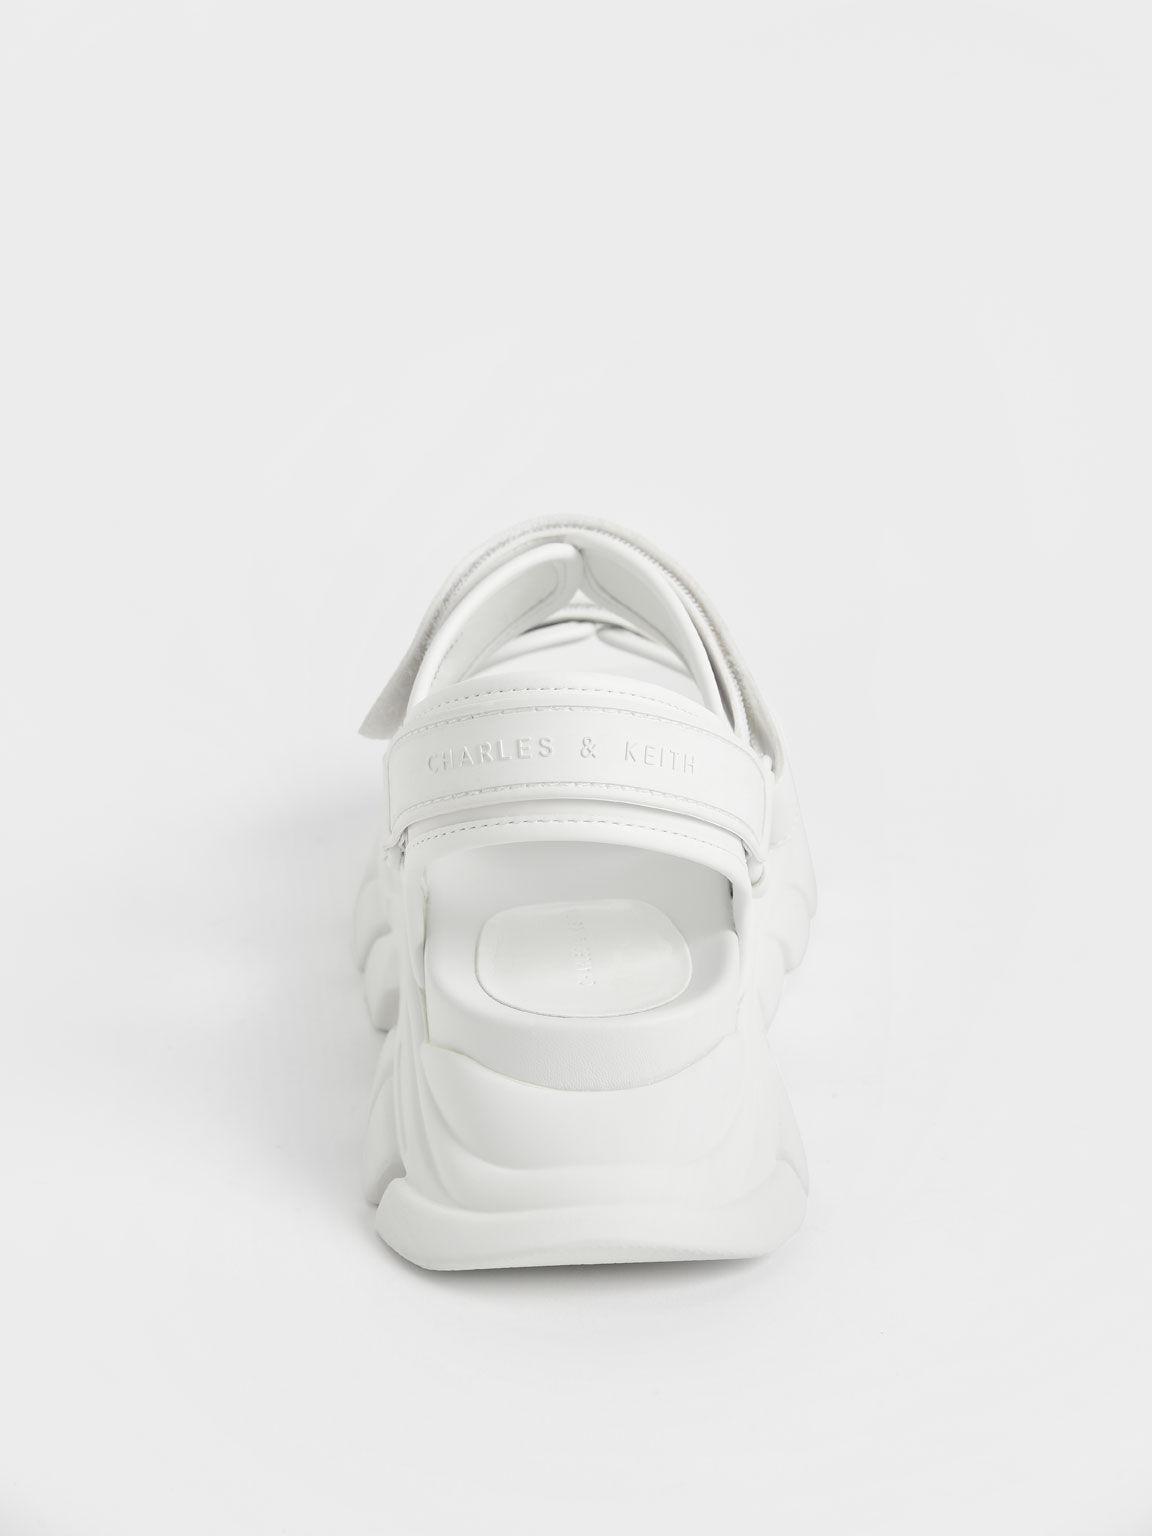 Chunky Sports Sandals, White, hi-res